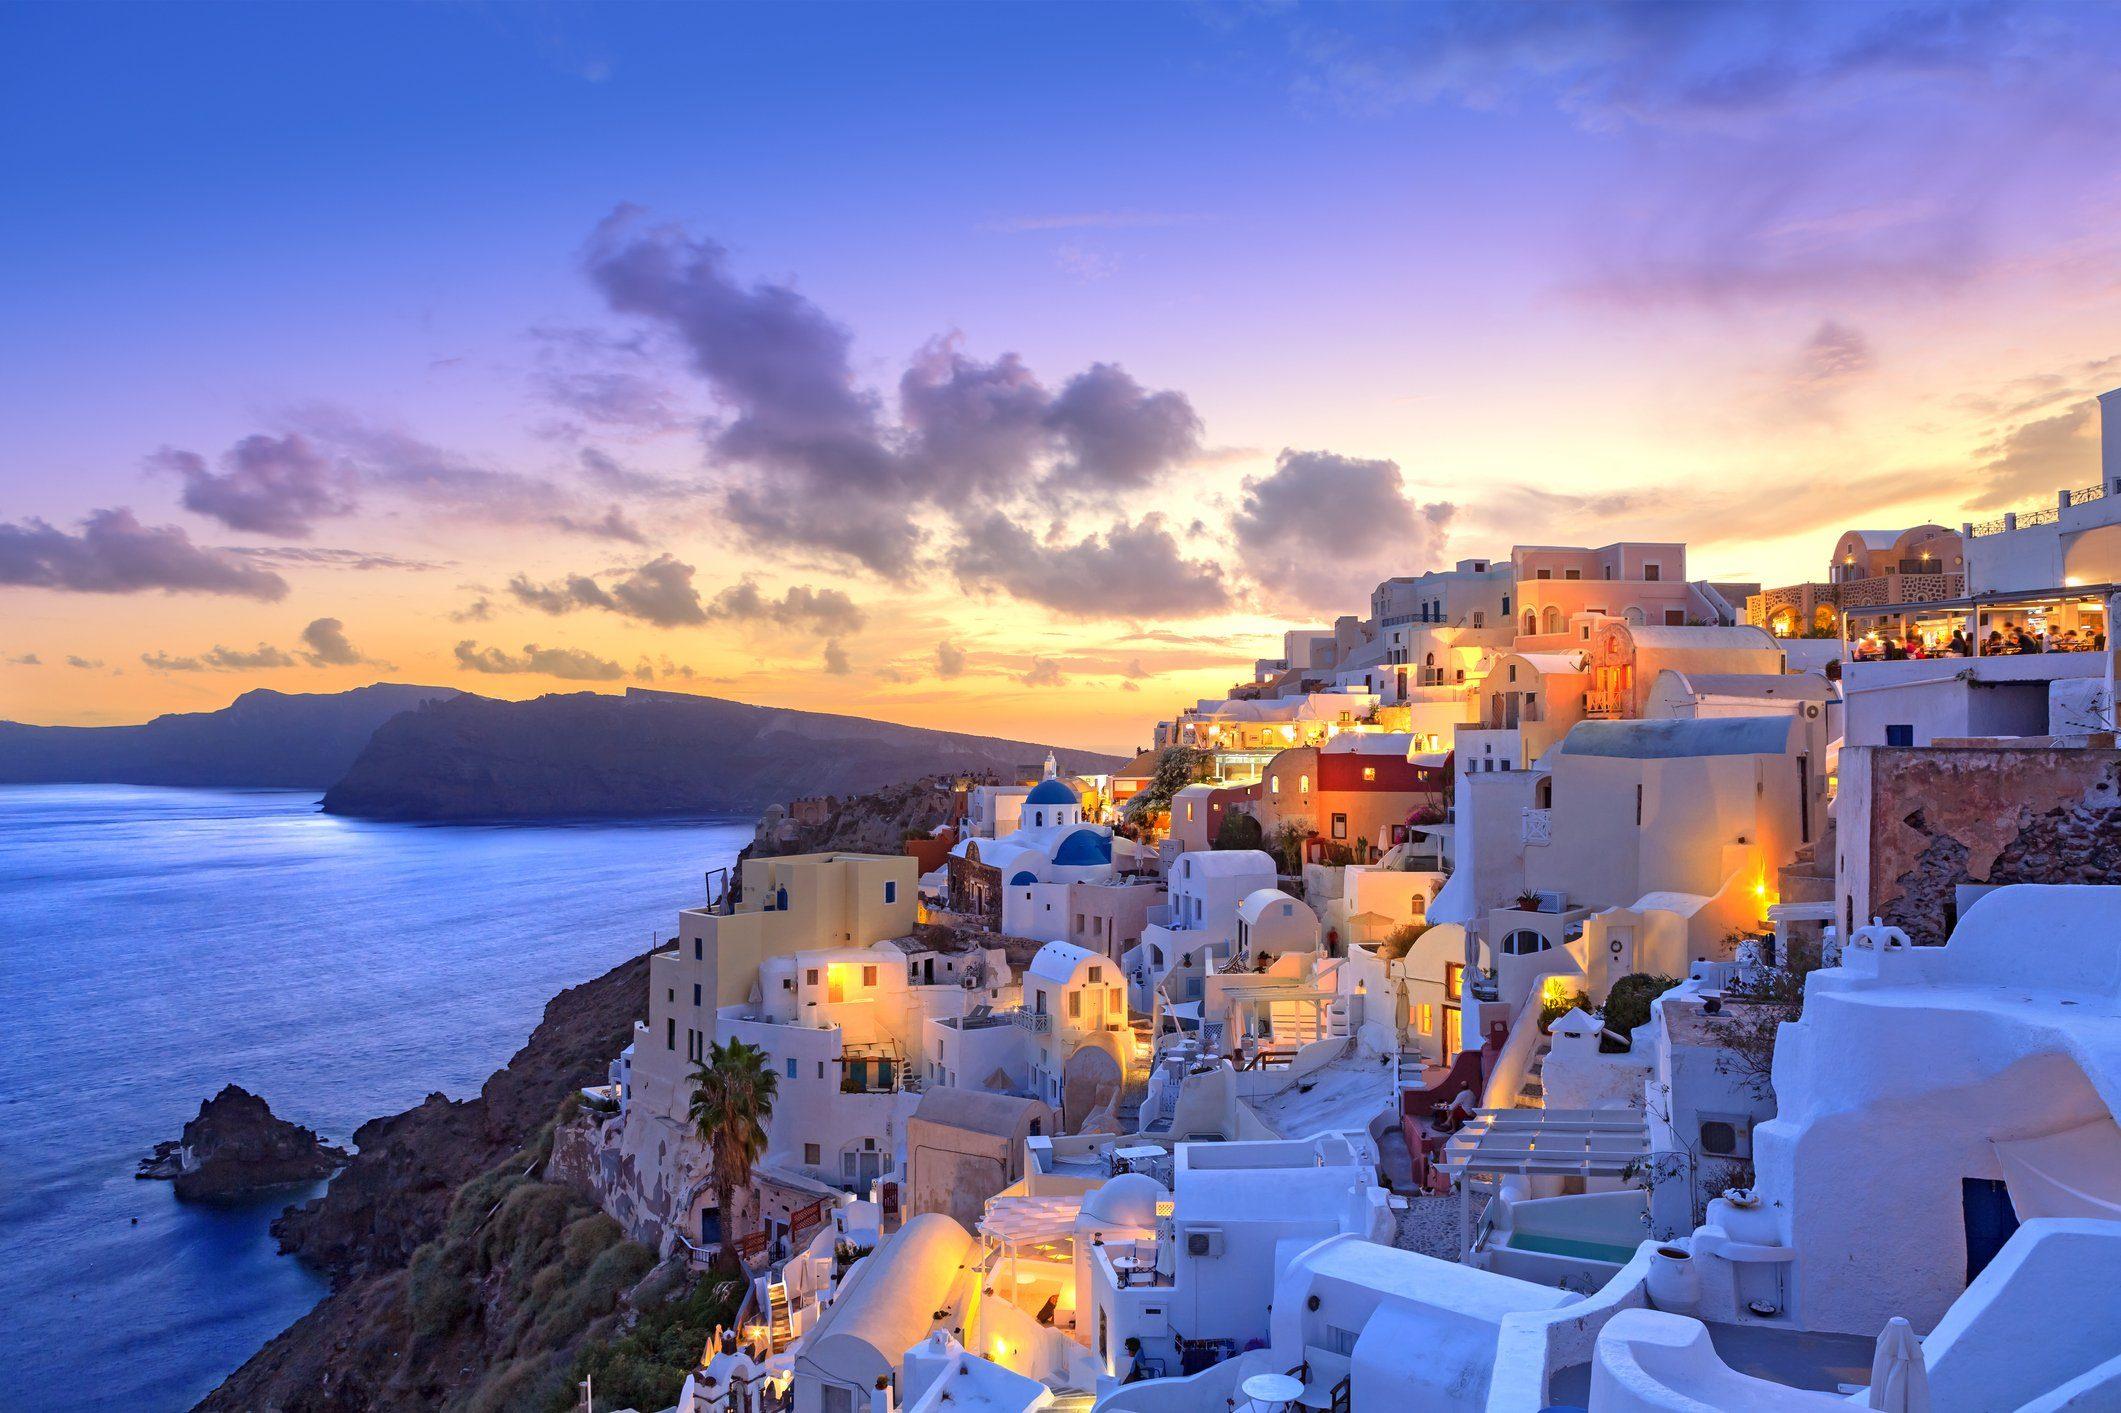 Santorini sunset at dawn village of Oia Greece